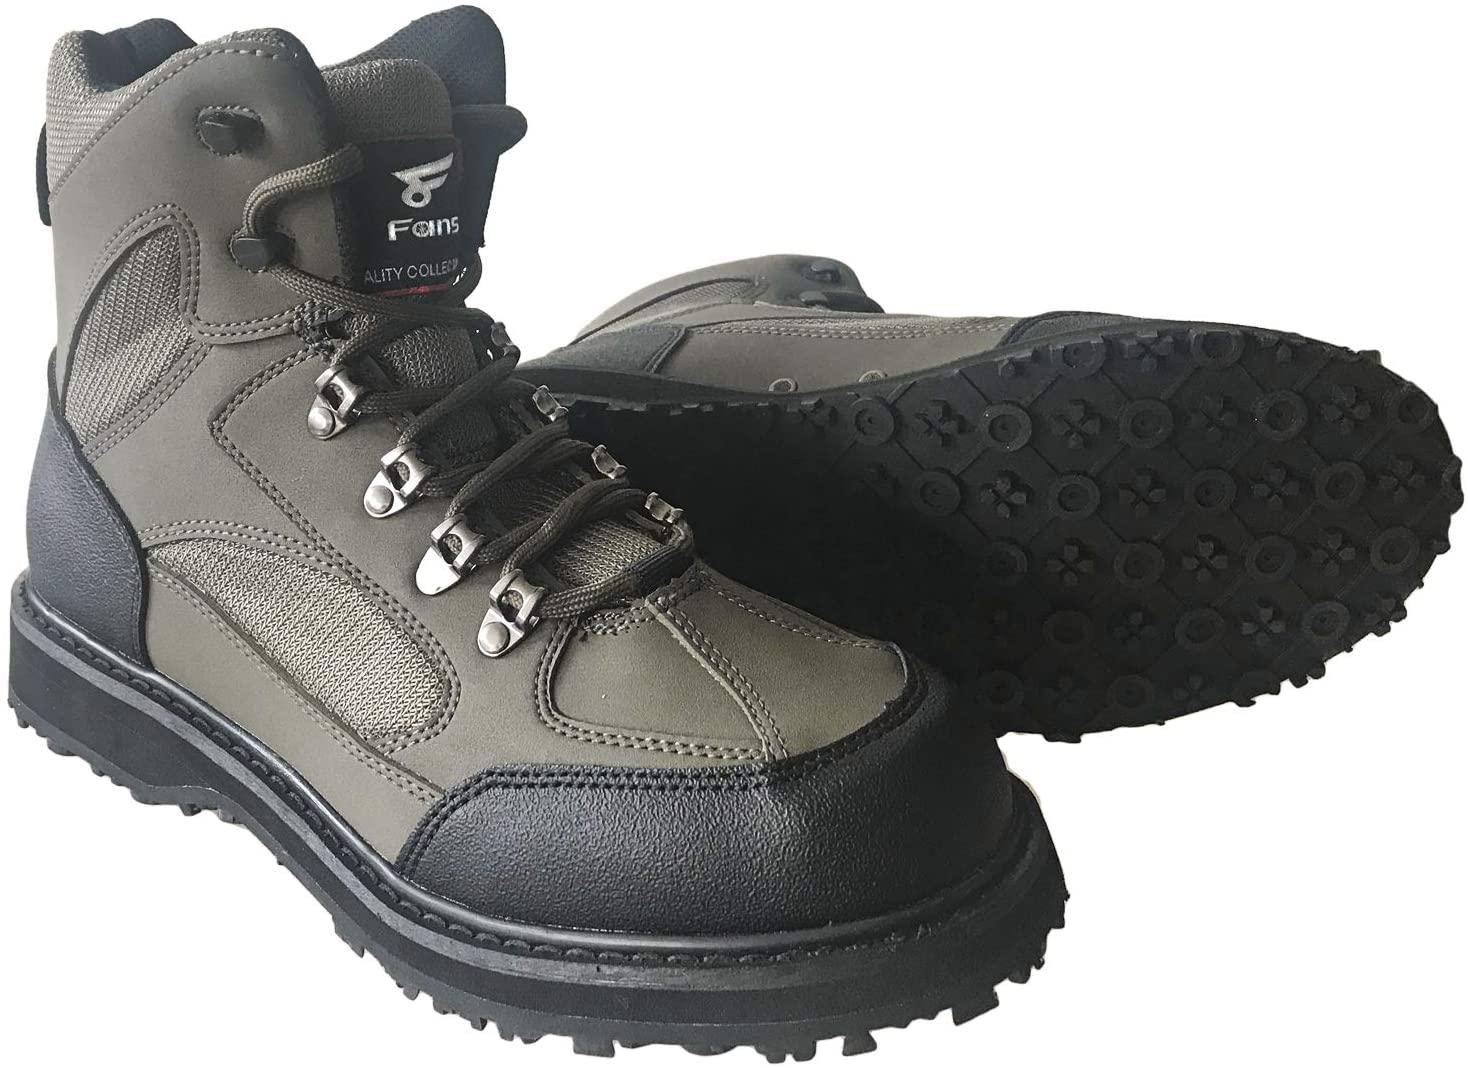 Lightweight saltwater wading boots